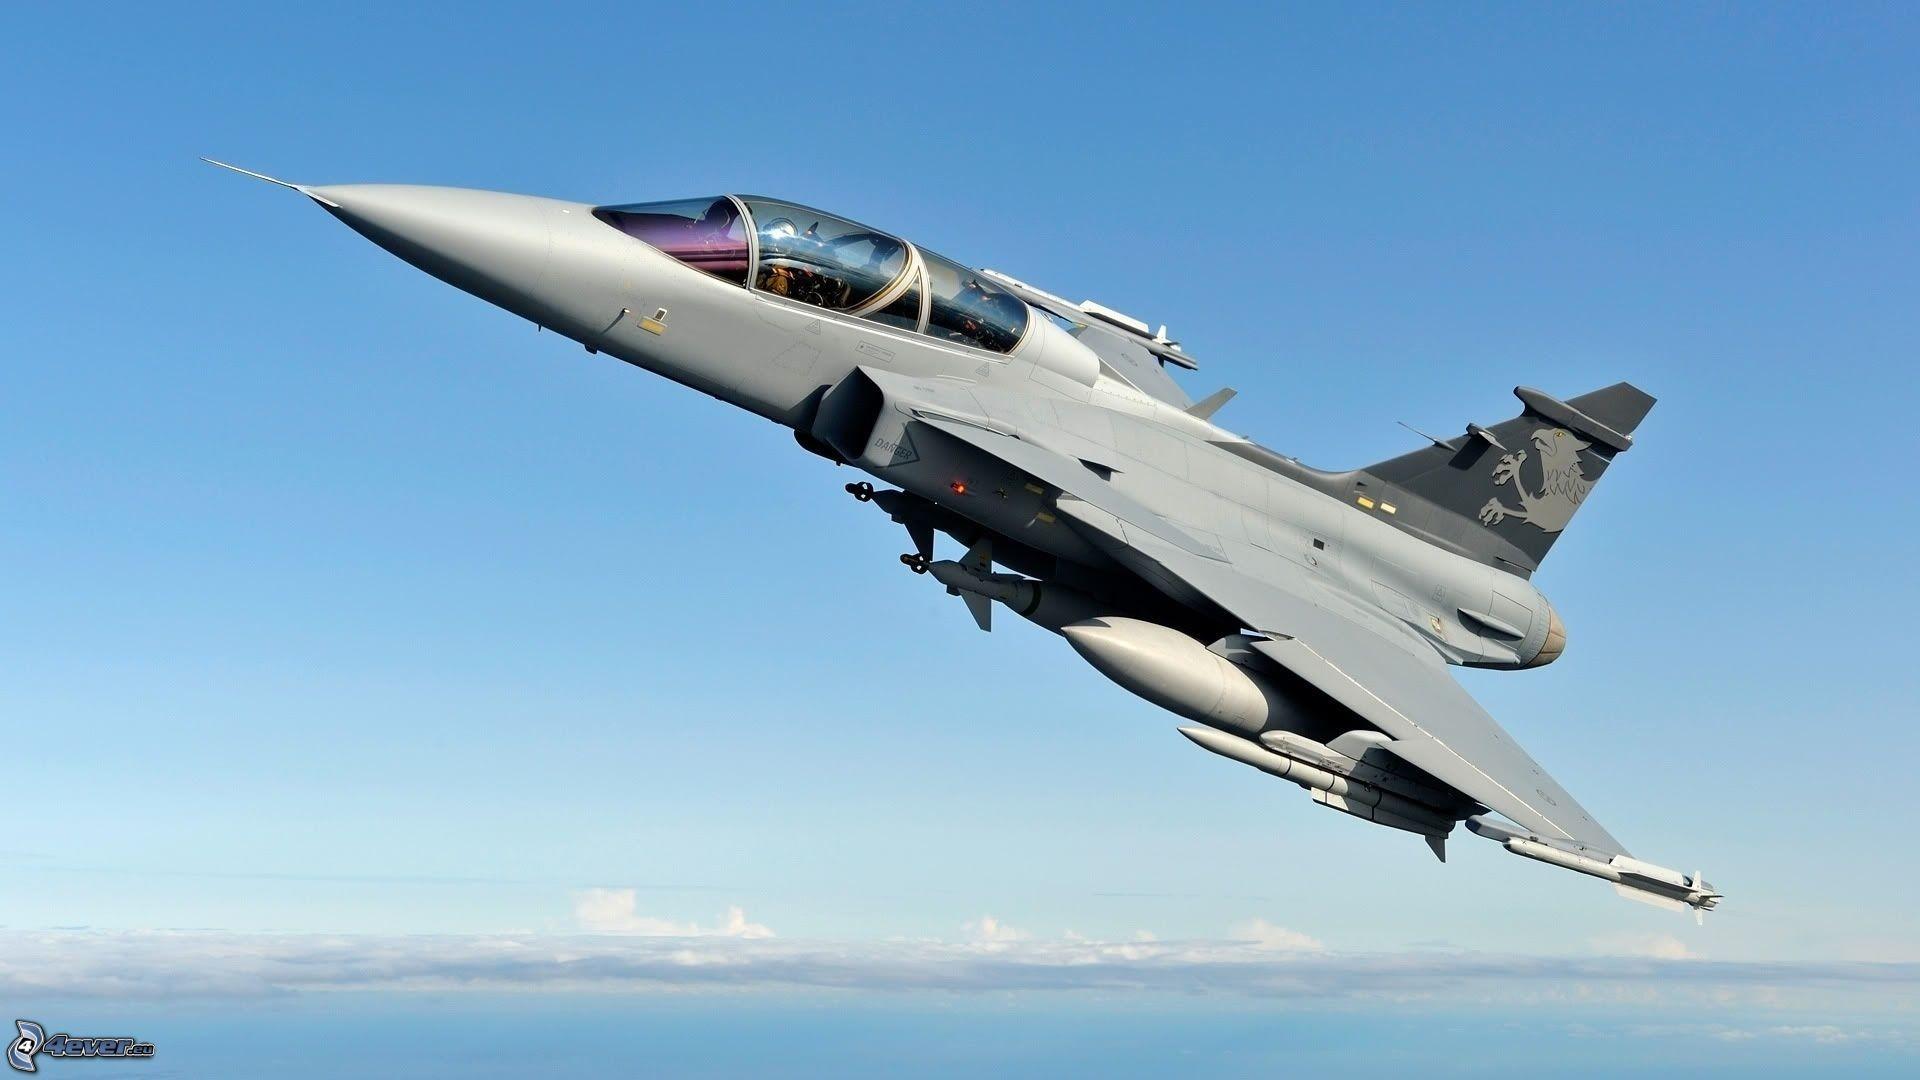 Wallpaper : vehicle, airplane, military aircraft, Saab JAS